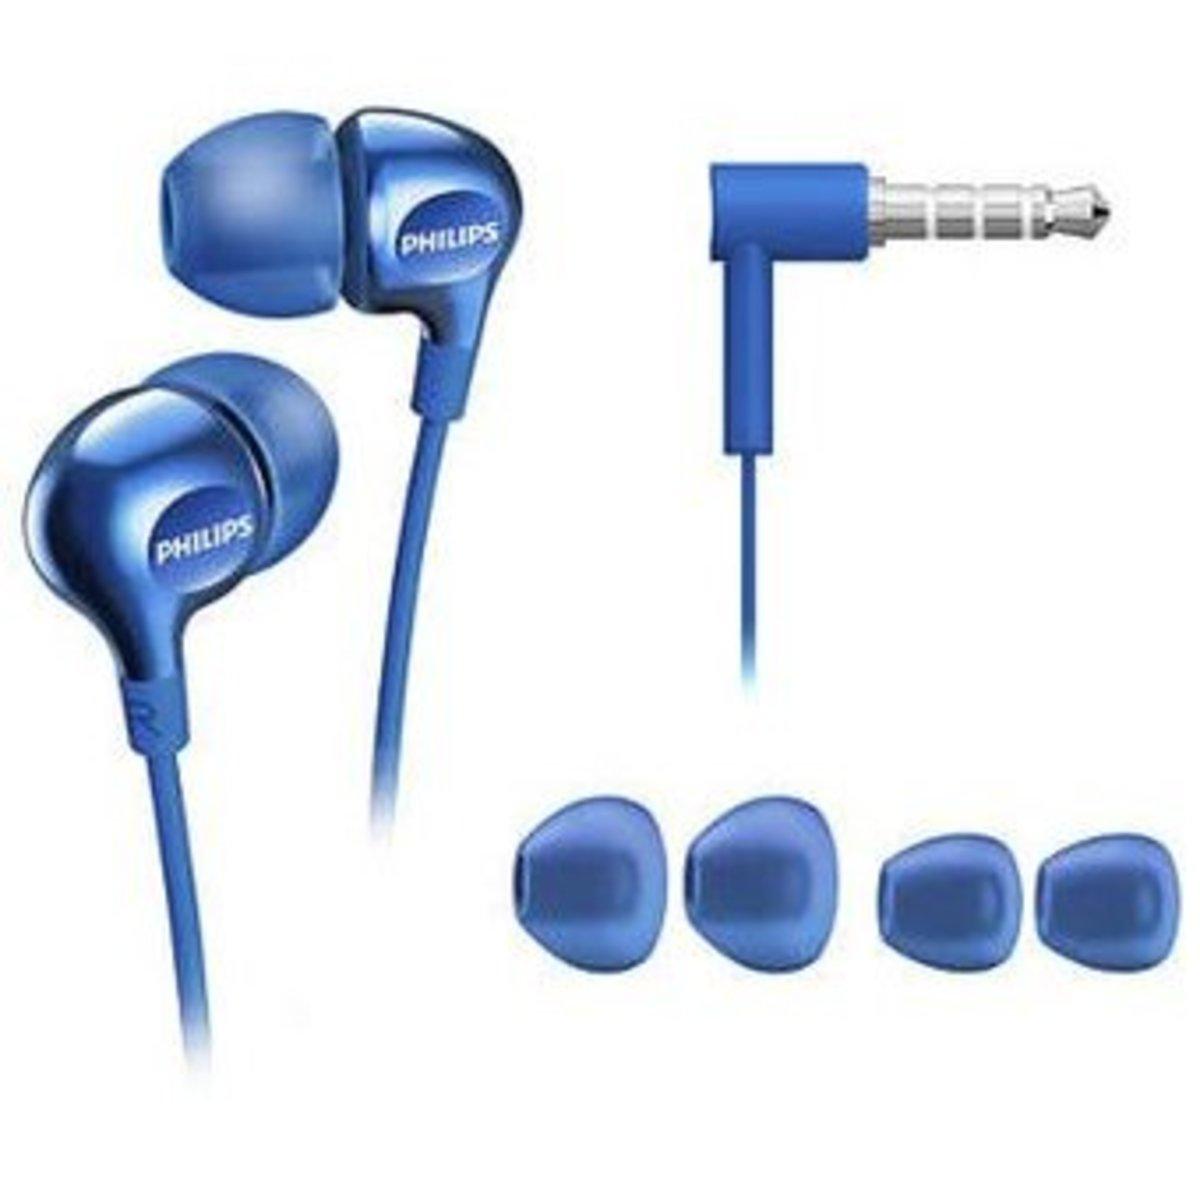 SHE3705 入耳式立體聲耳機連麥克風/藍色 (平行進口)